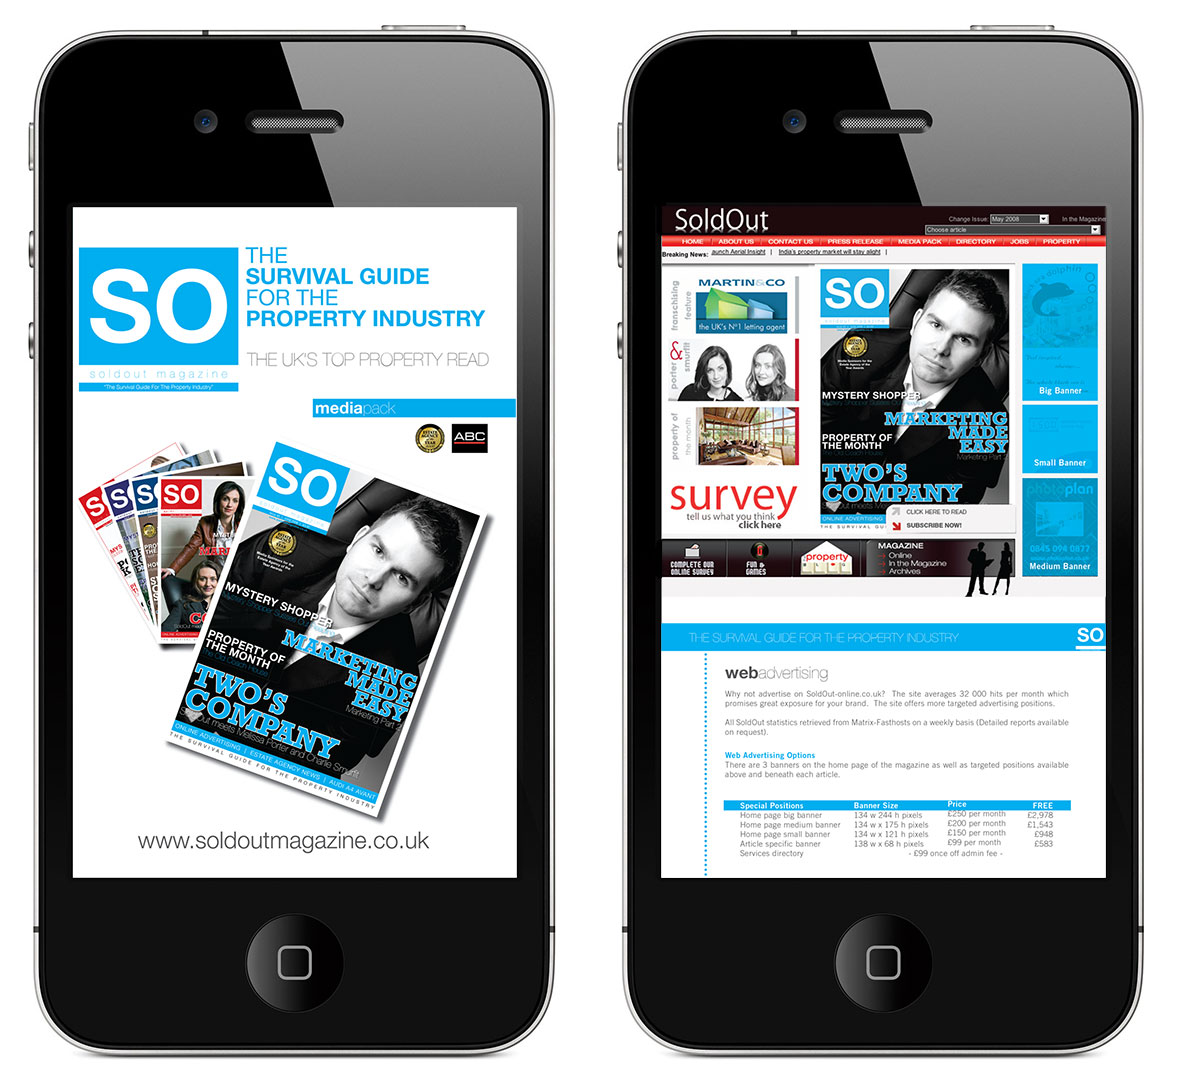 SO Magazine Advertising Rates